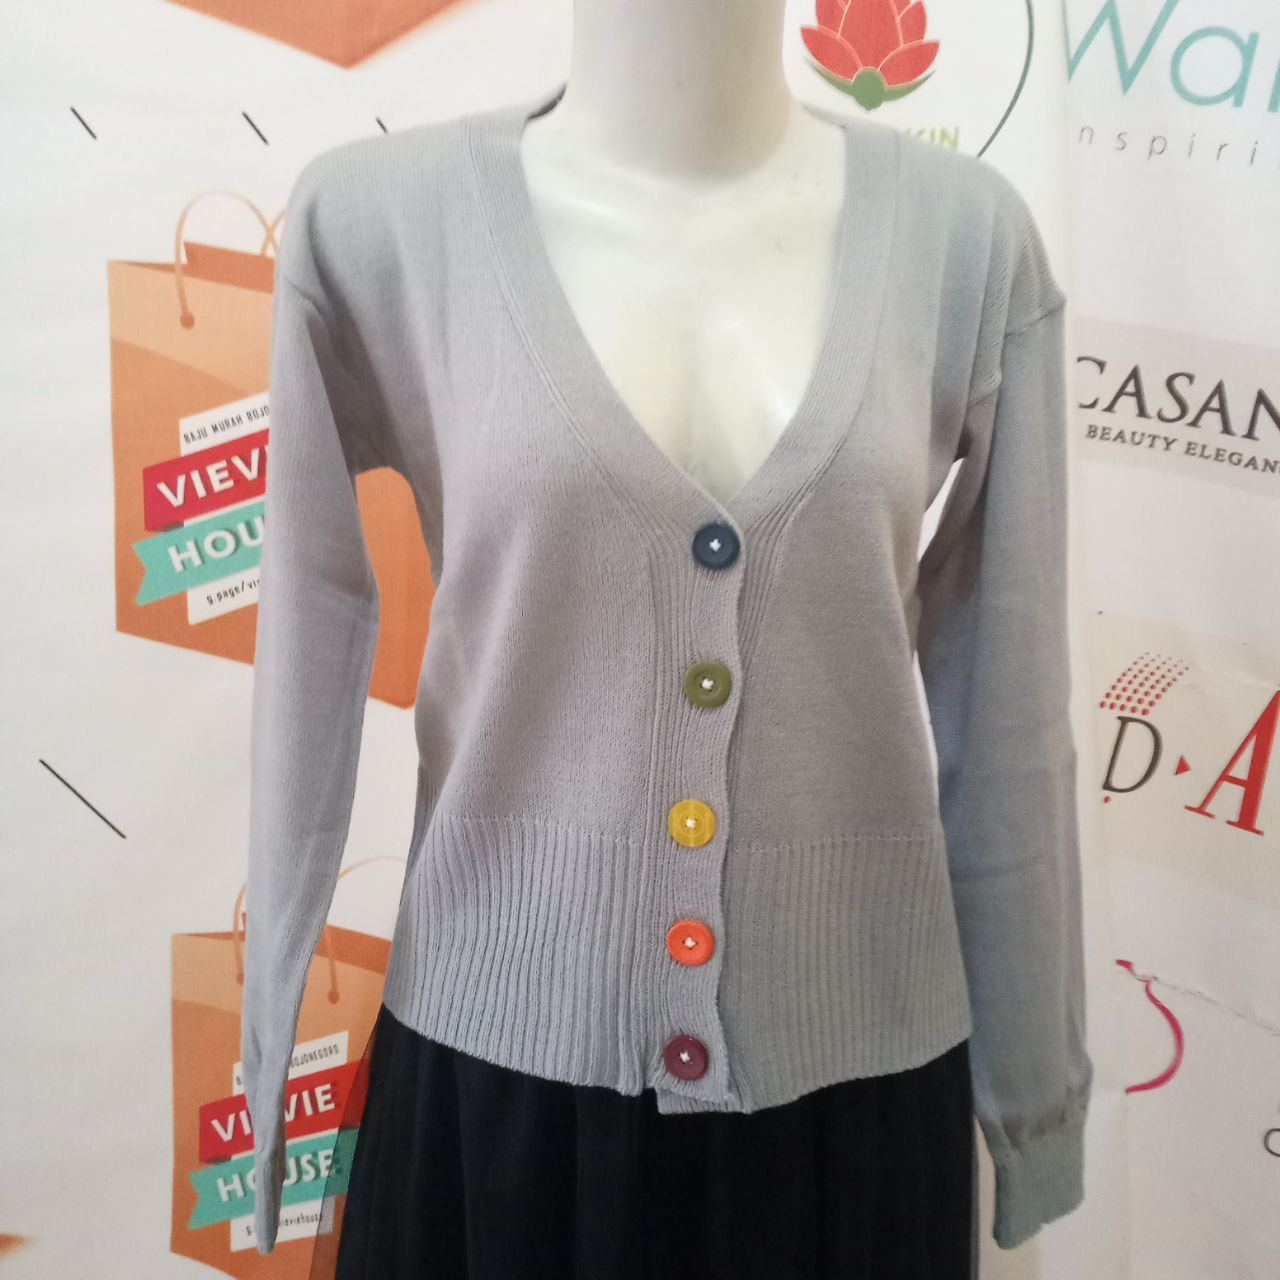 ini adalah Rajut Kancing Pelangi Abu Muda, size: XXL, material: Knitt, color: Light grey, brand: Rajut cardy indonesia, age_group: all ages, gender: female